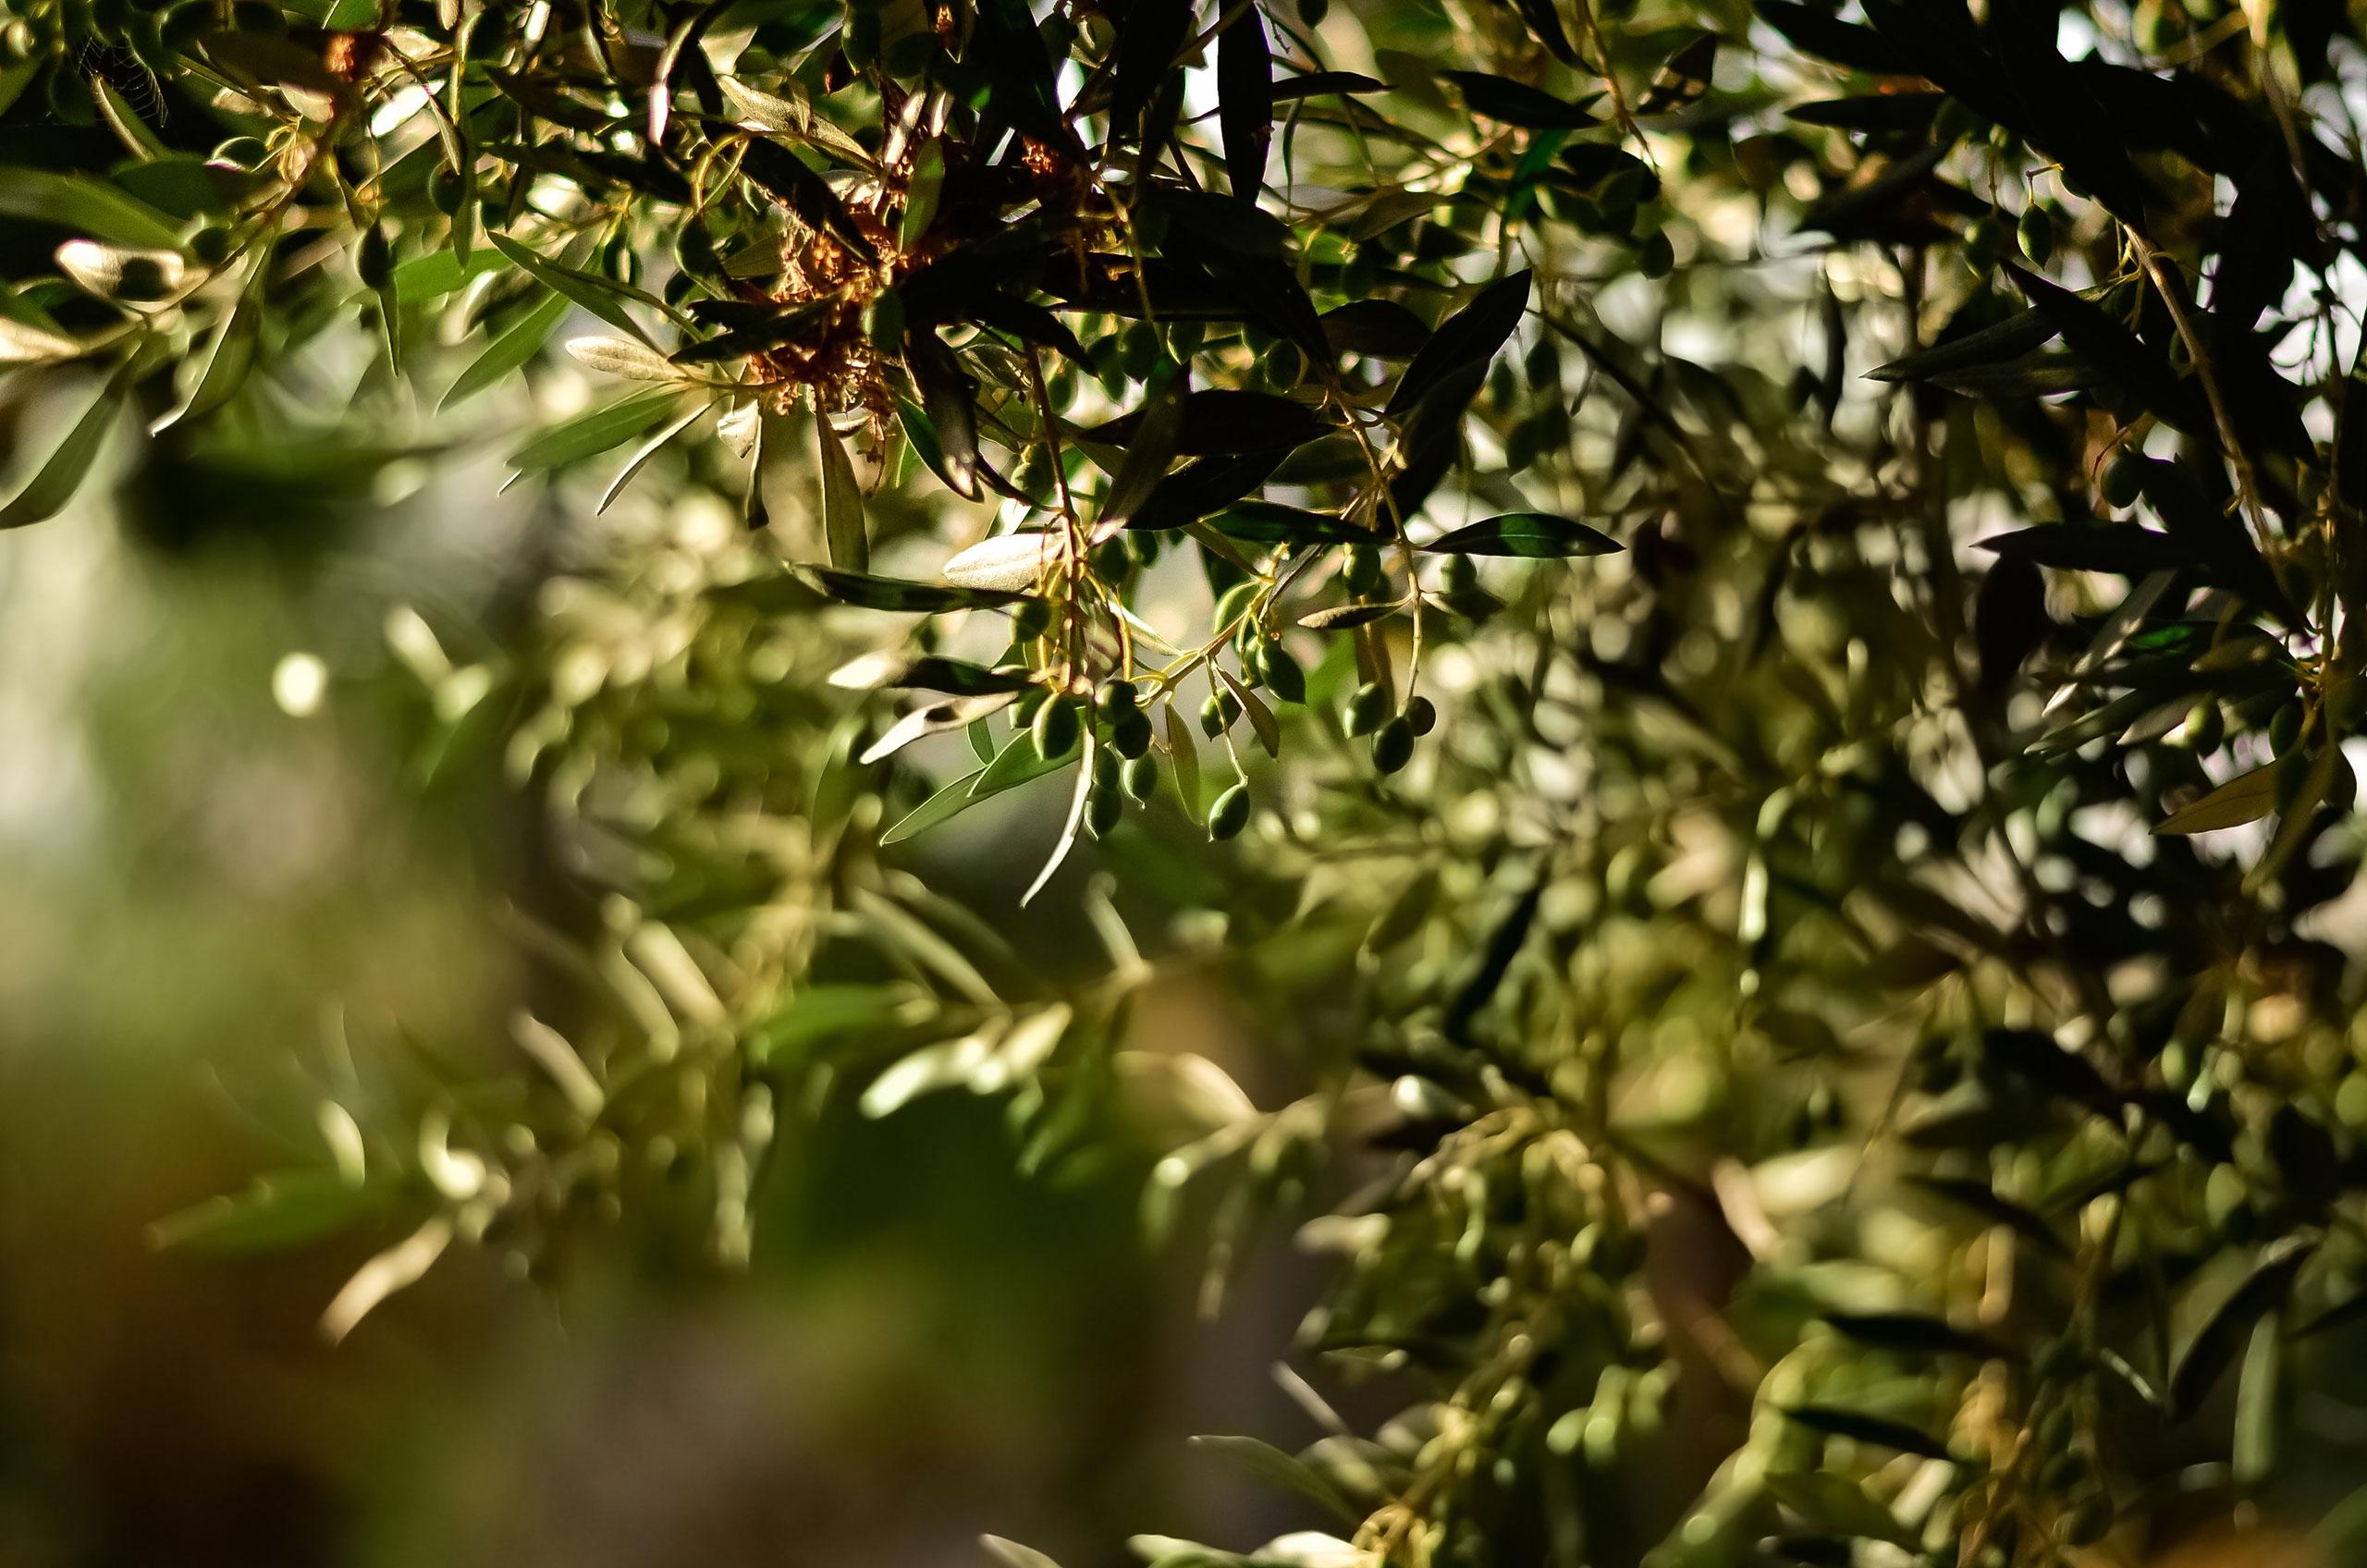 Farmers' Market – Olive Oil from Greece